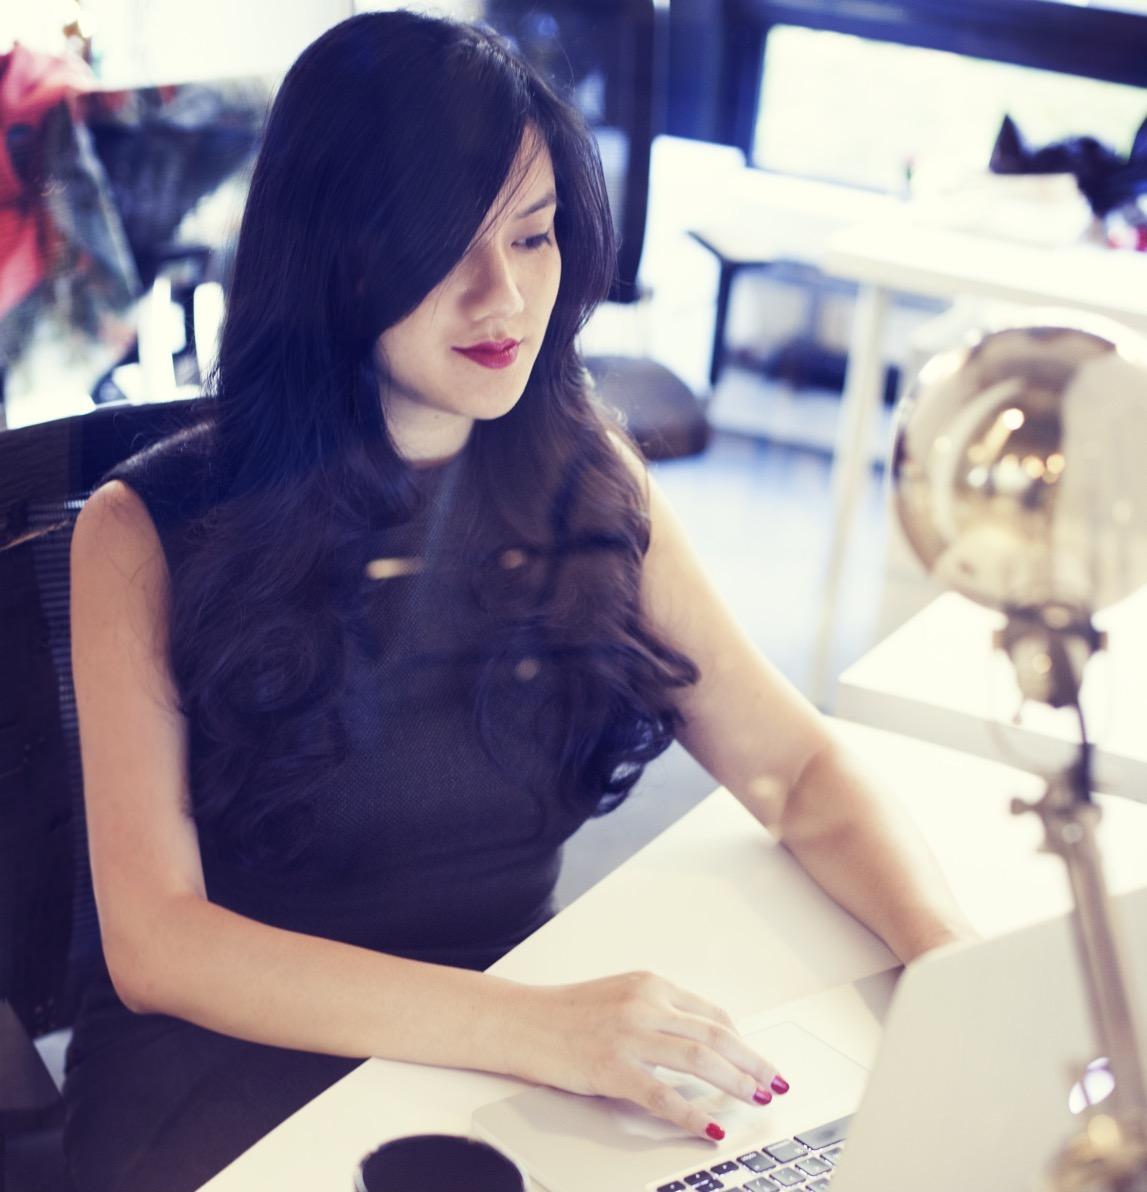 Tiffany Pham, founder and CEO of Mogul